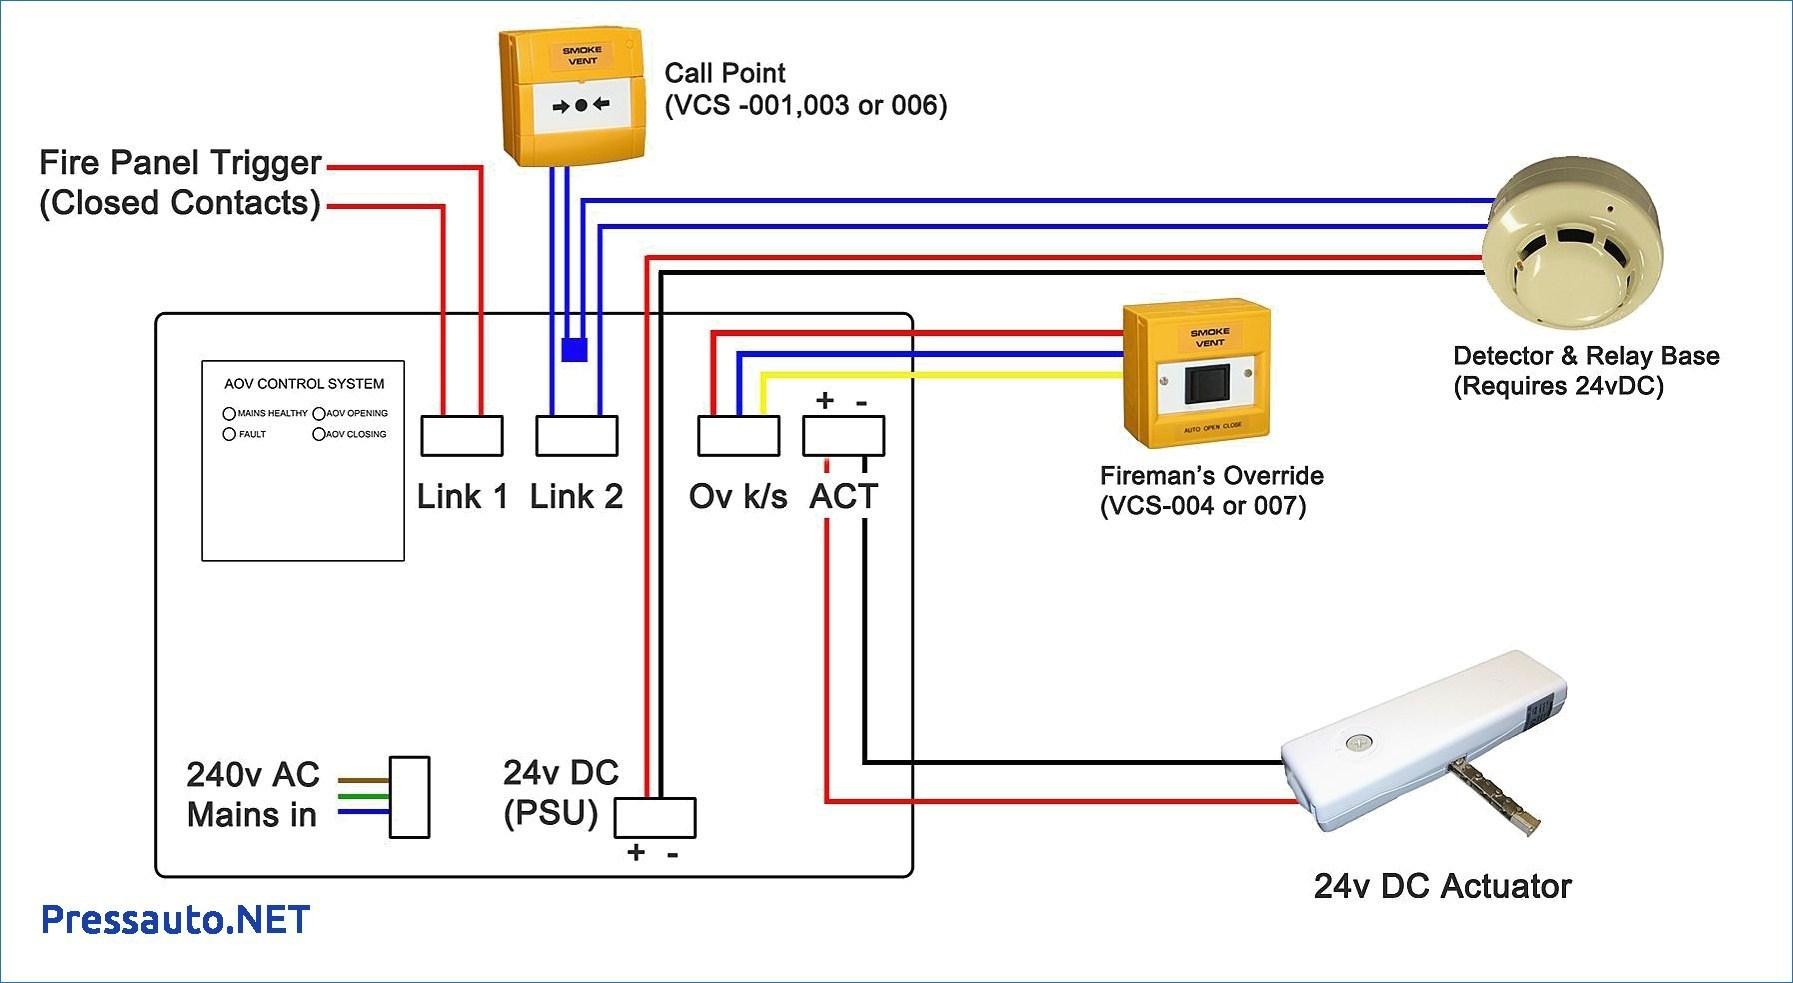 Addressable Smoke Detector Wiring Diagram | Wiring Diagram - Smoke Detector Wiring Diagram